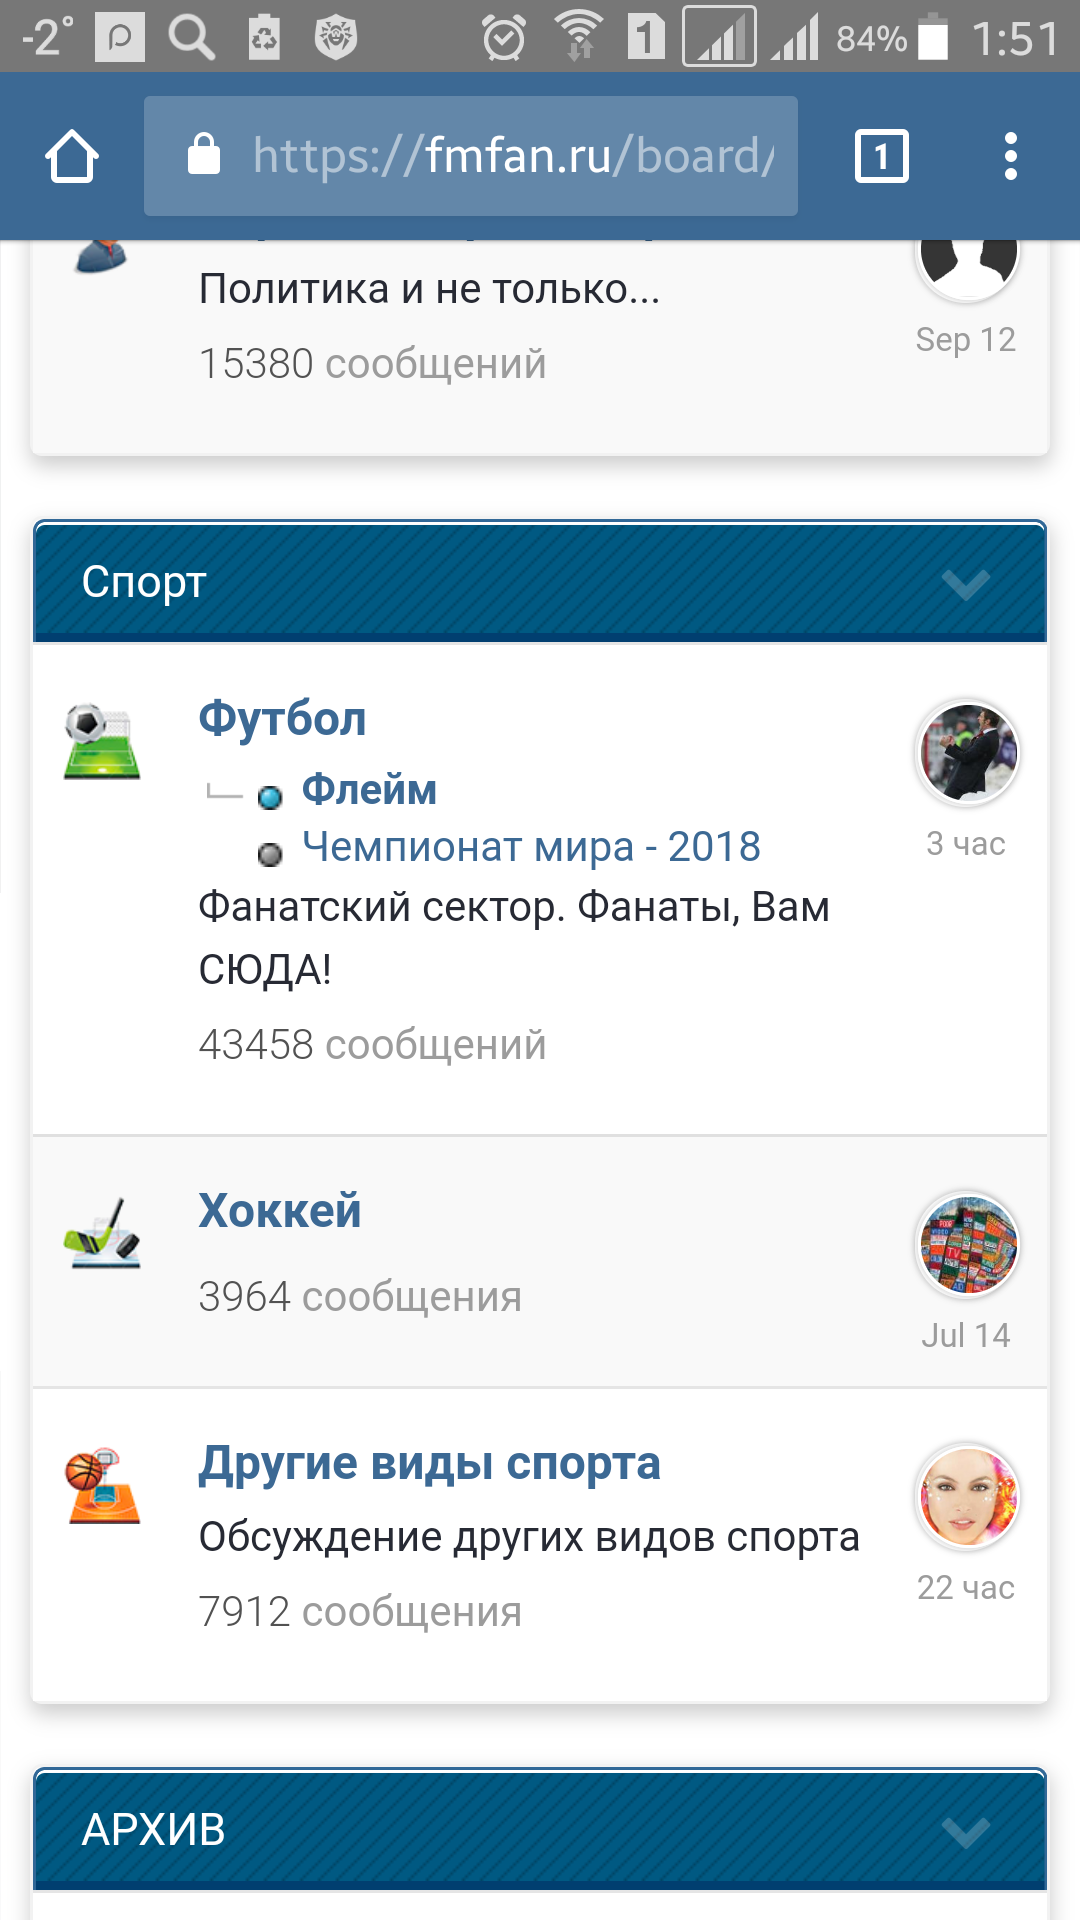 Screenshot_2017-09-29-01-51-02.png